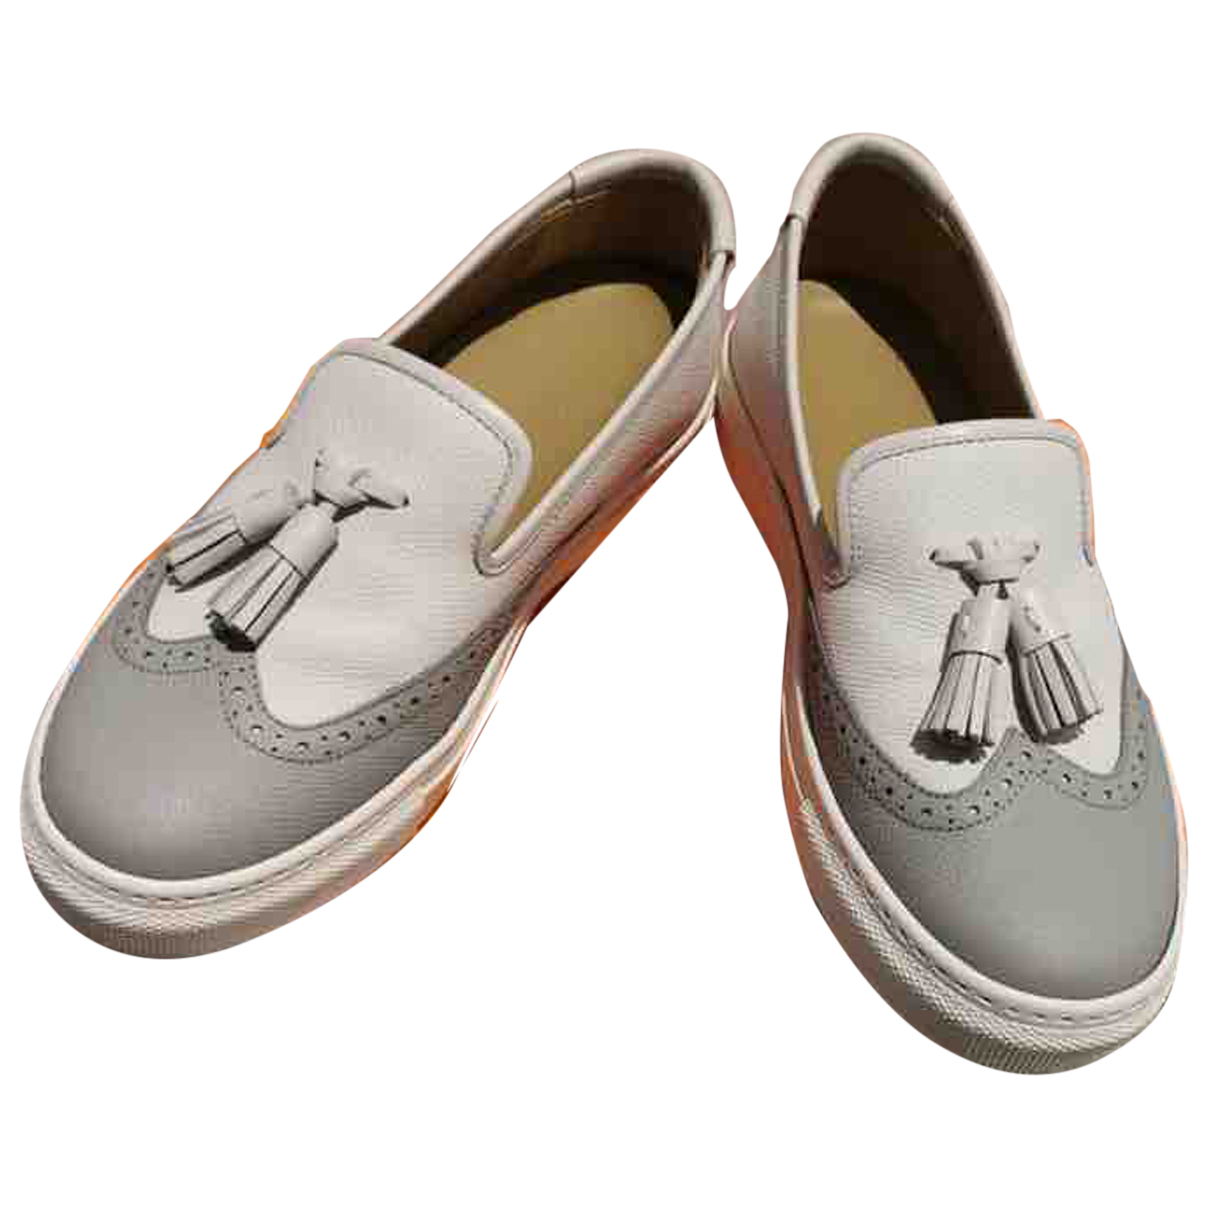 Hermès N White Leather Trainers for Women 35.5 EU